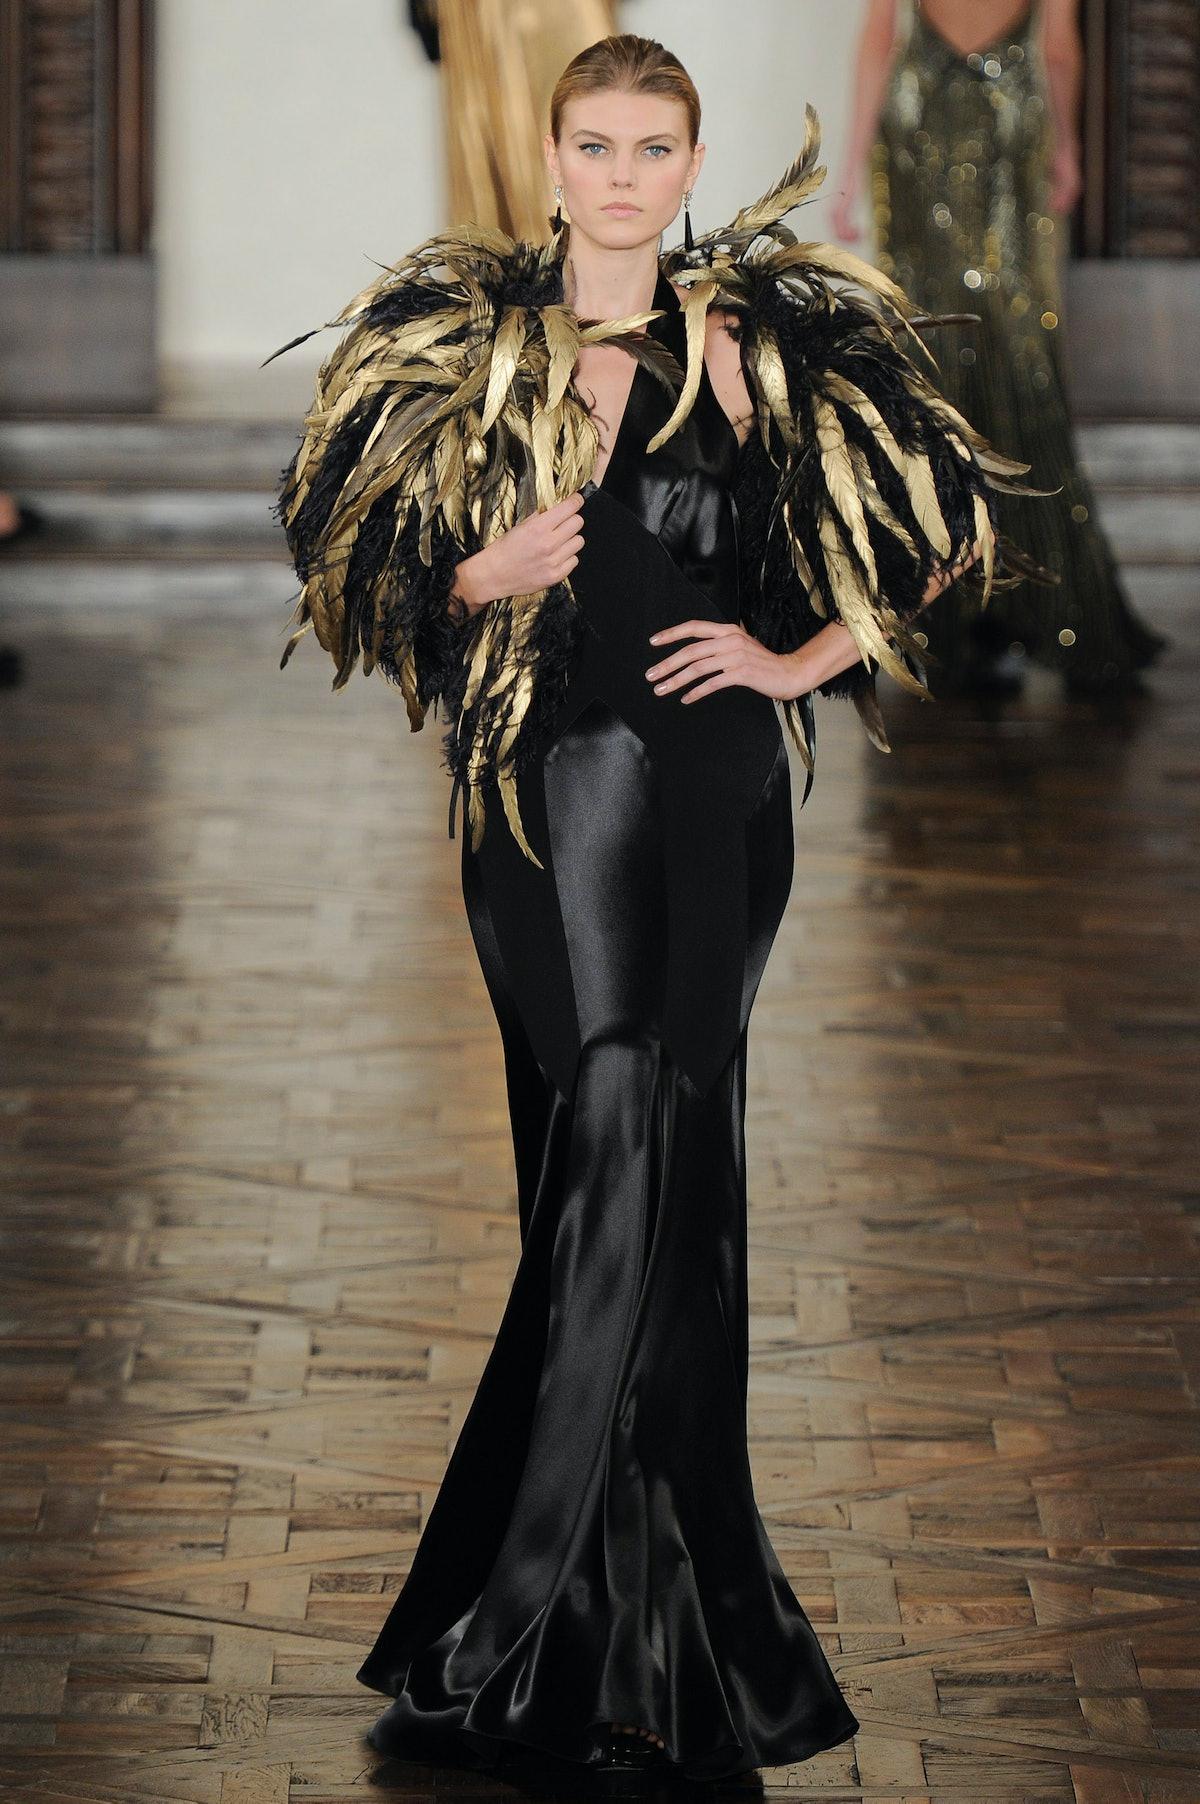 Ralph Lauren Fall 2012 RTW - feathered shawl